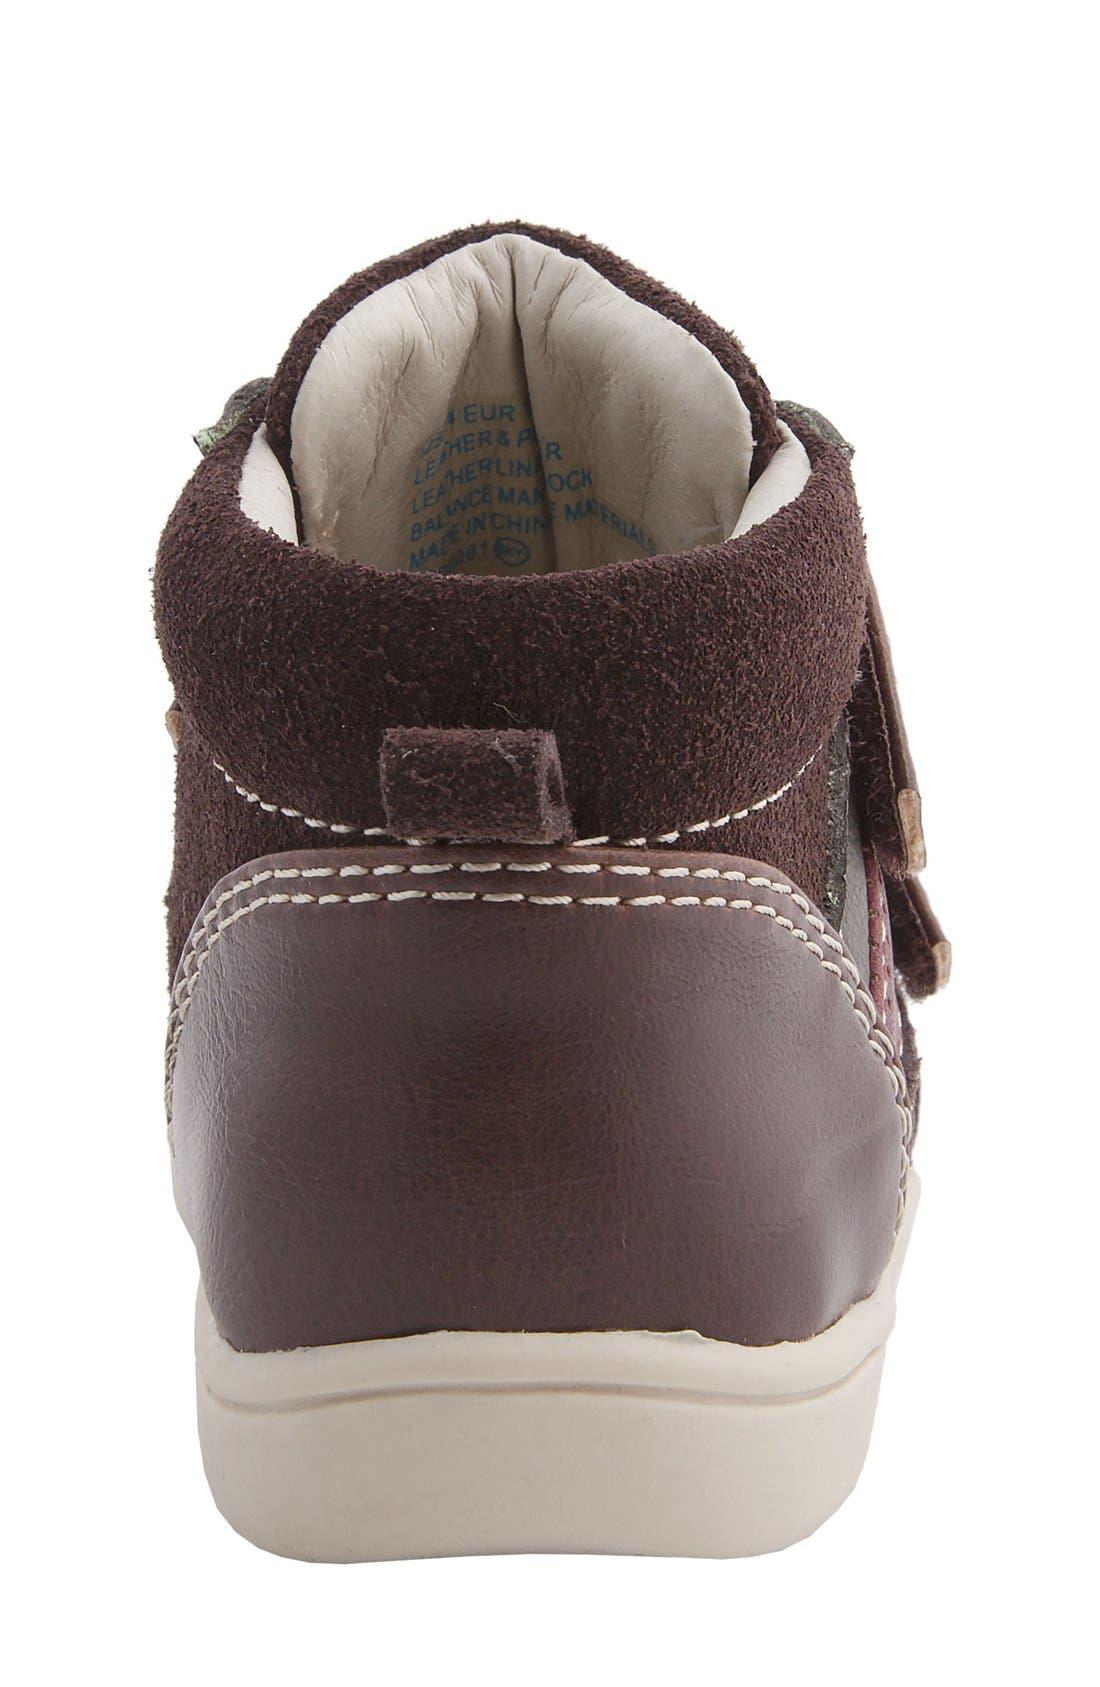 Nina 'Cairo' High Top Sneaker,                             Alternate thumbnail 8, color,